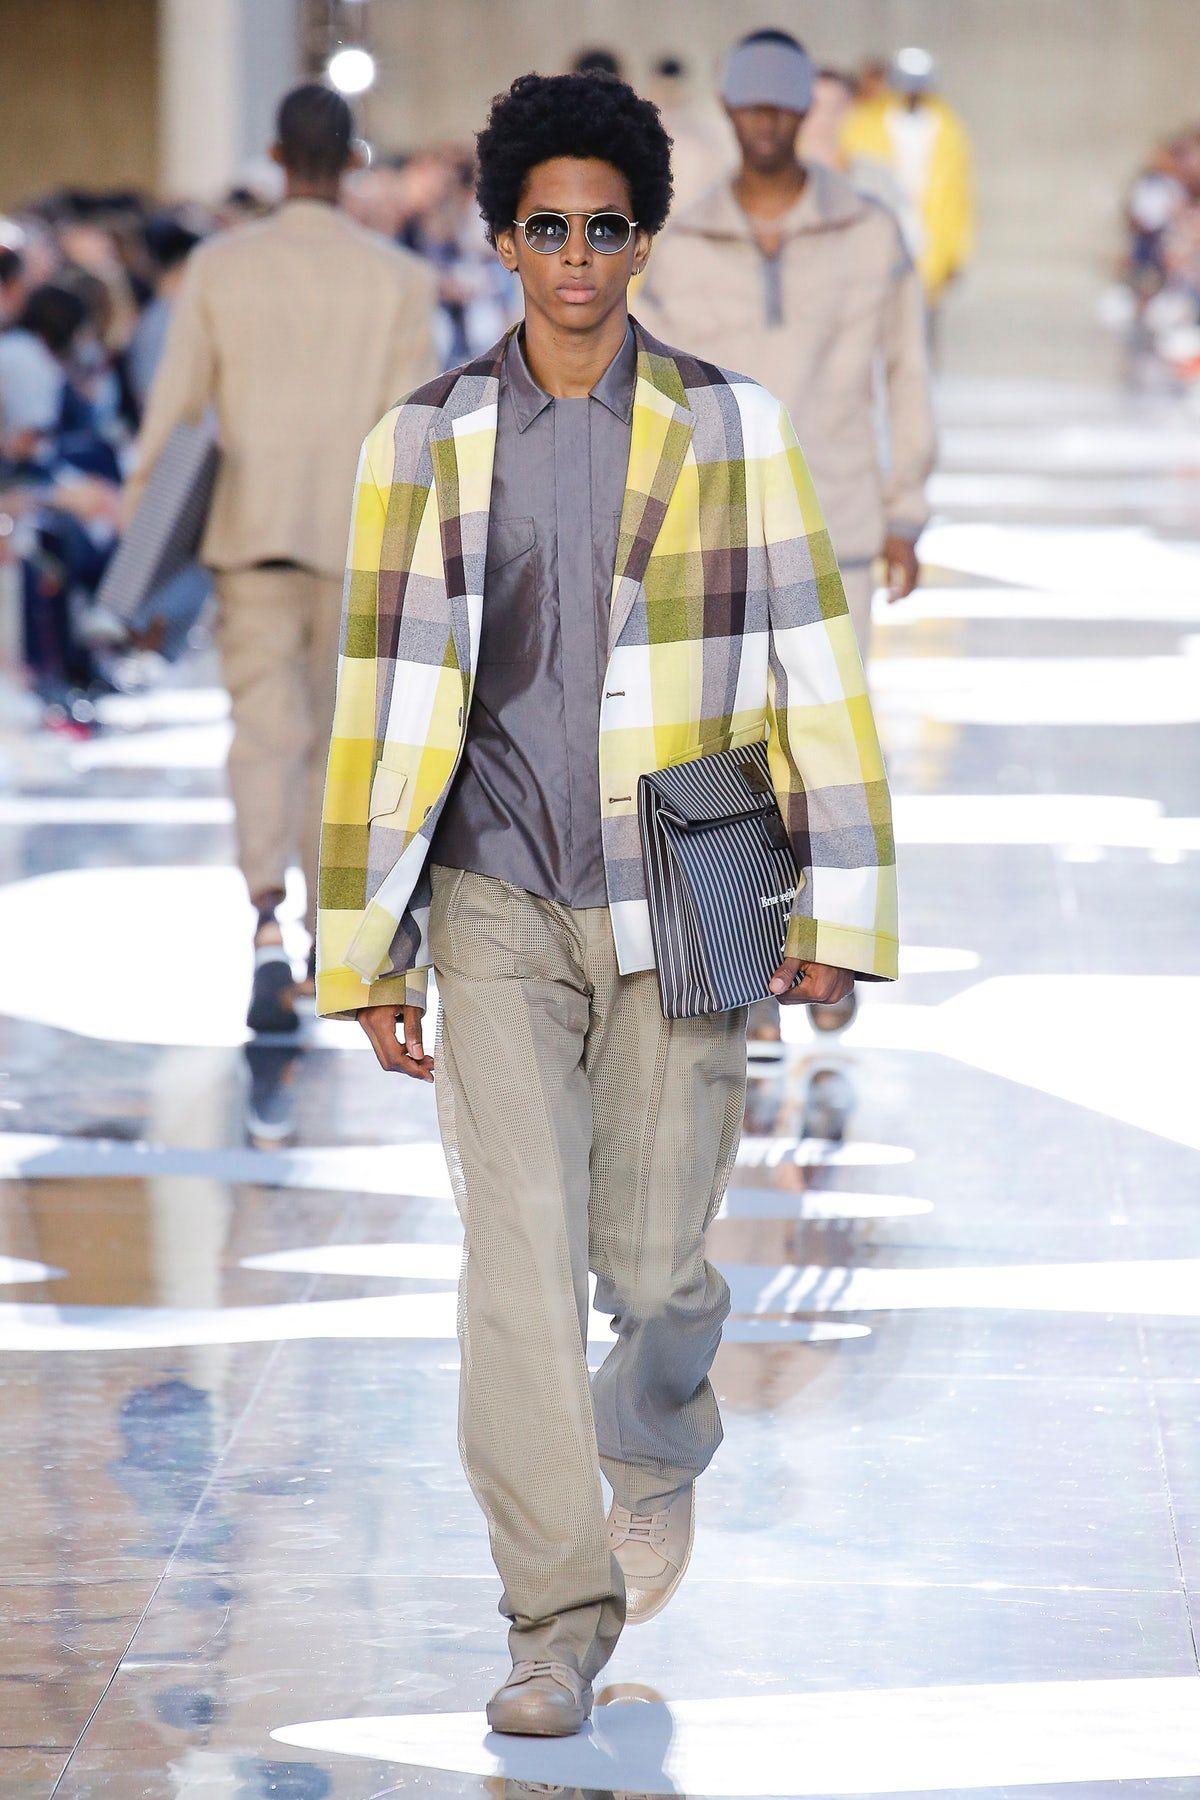 Ermenegildo Zegna   Menswear - Spring 2019   Look 21 6e5eb9b7efc1